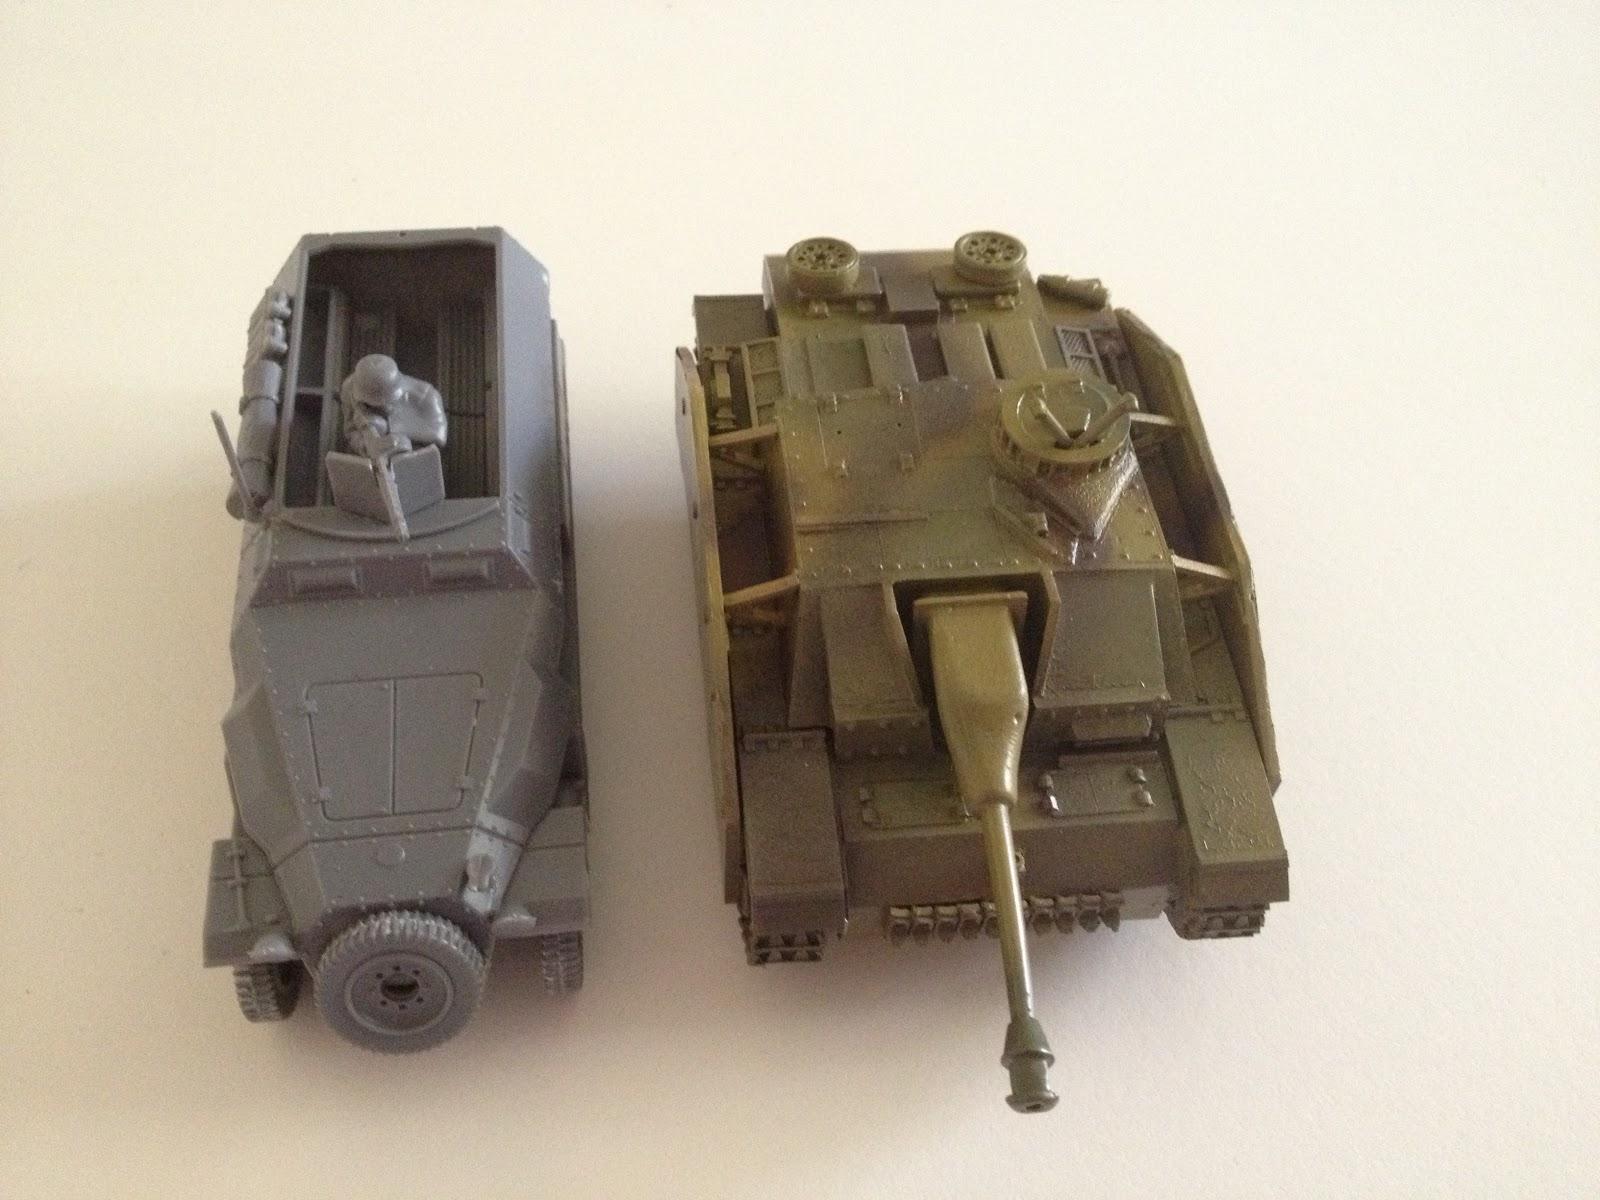 Vue de dessus : comparaison Sdkfz 251/1 - Stug III ausf G